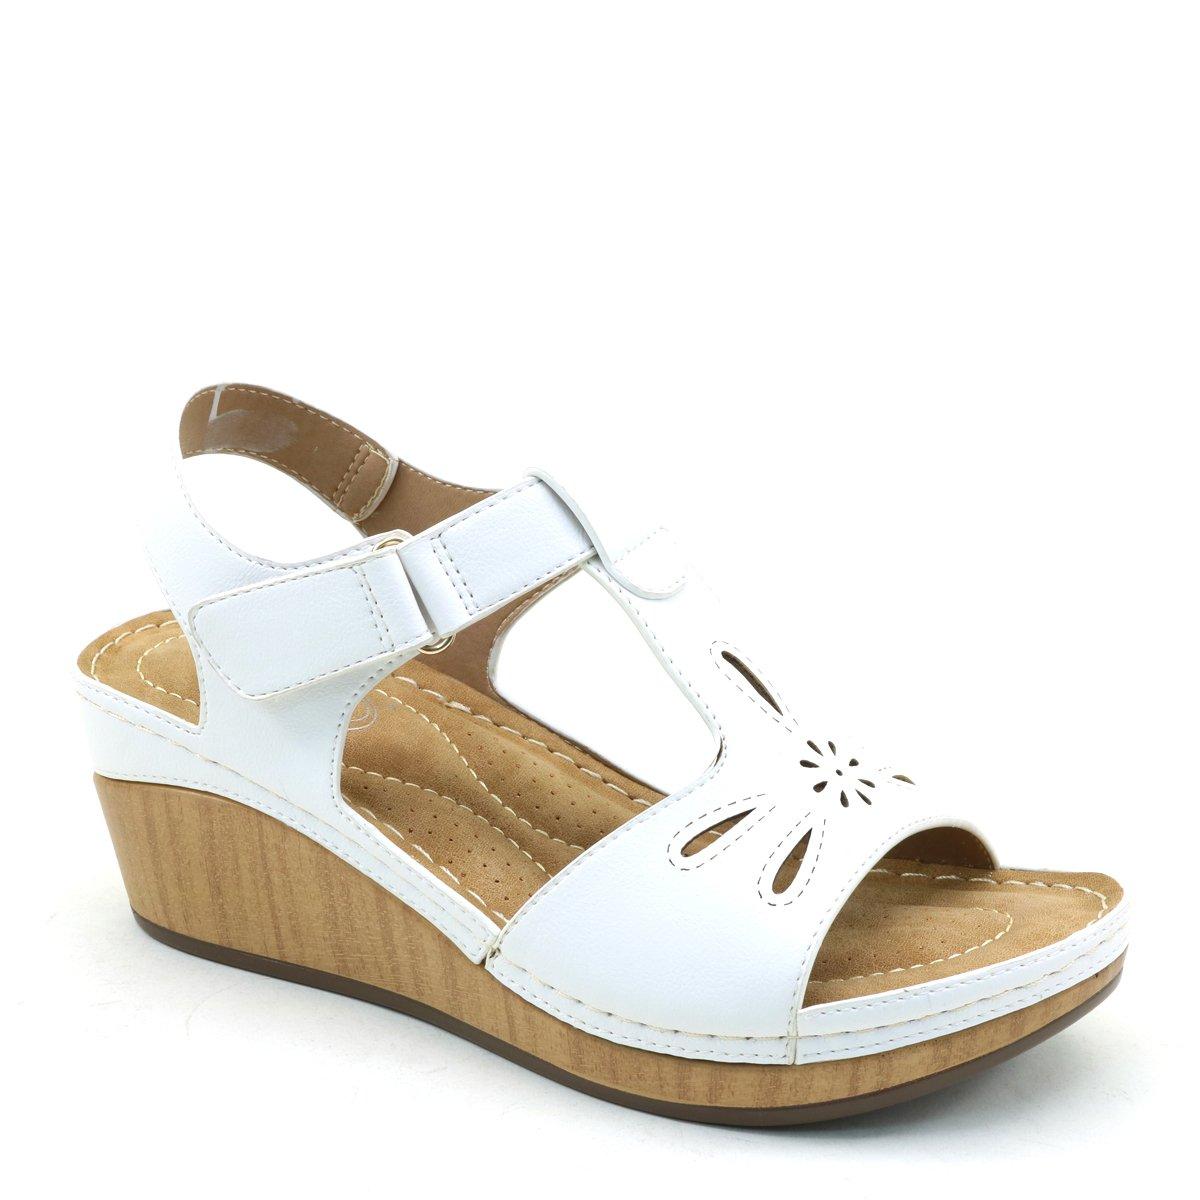 Master New Women's Comfort Wedge Flatform Sandals B07CMQL4F1 6.5 B(M) US|White